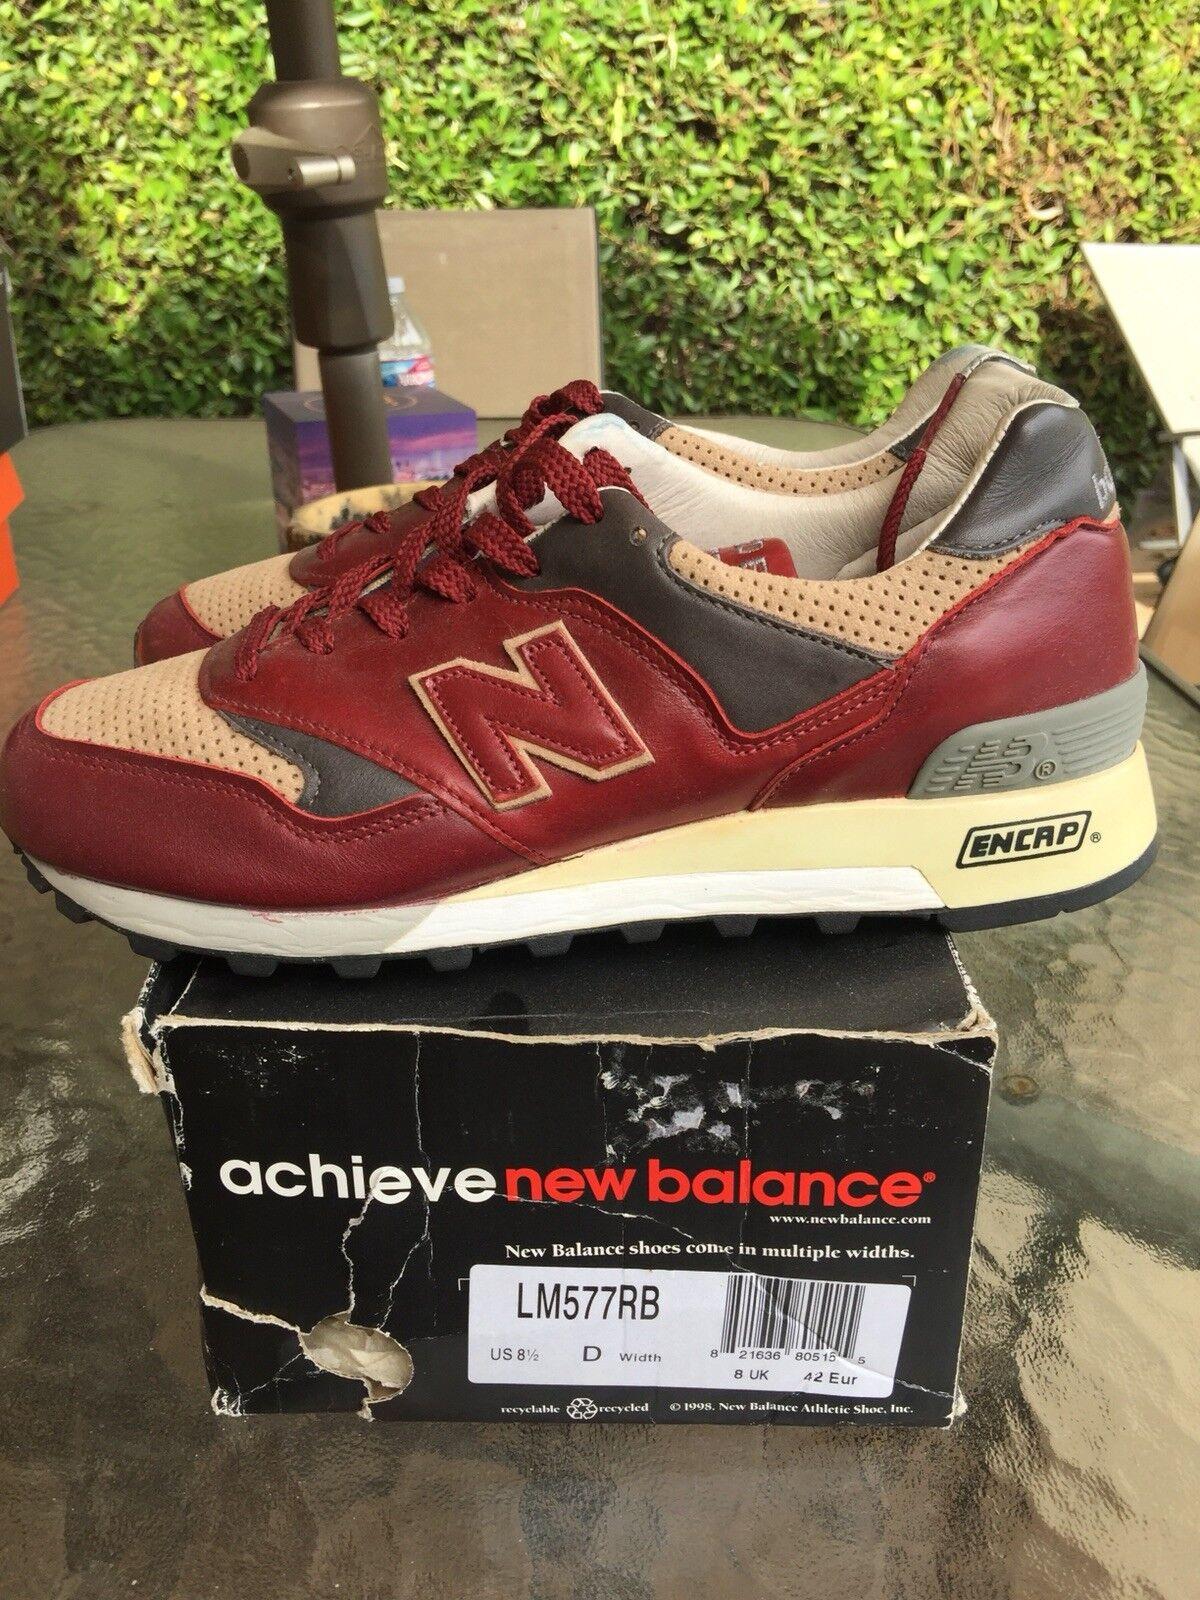 New Balance 577 RB Sz 8.5 US OG